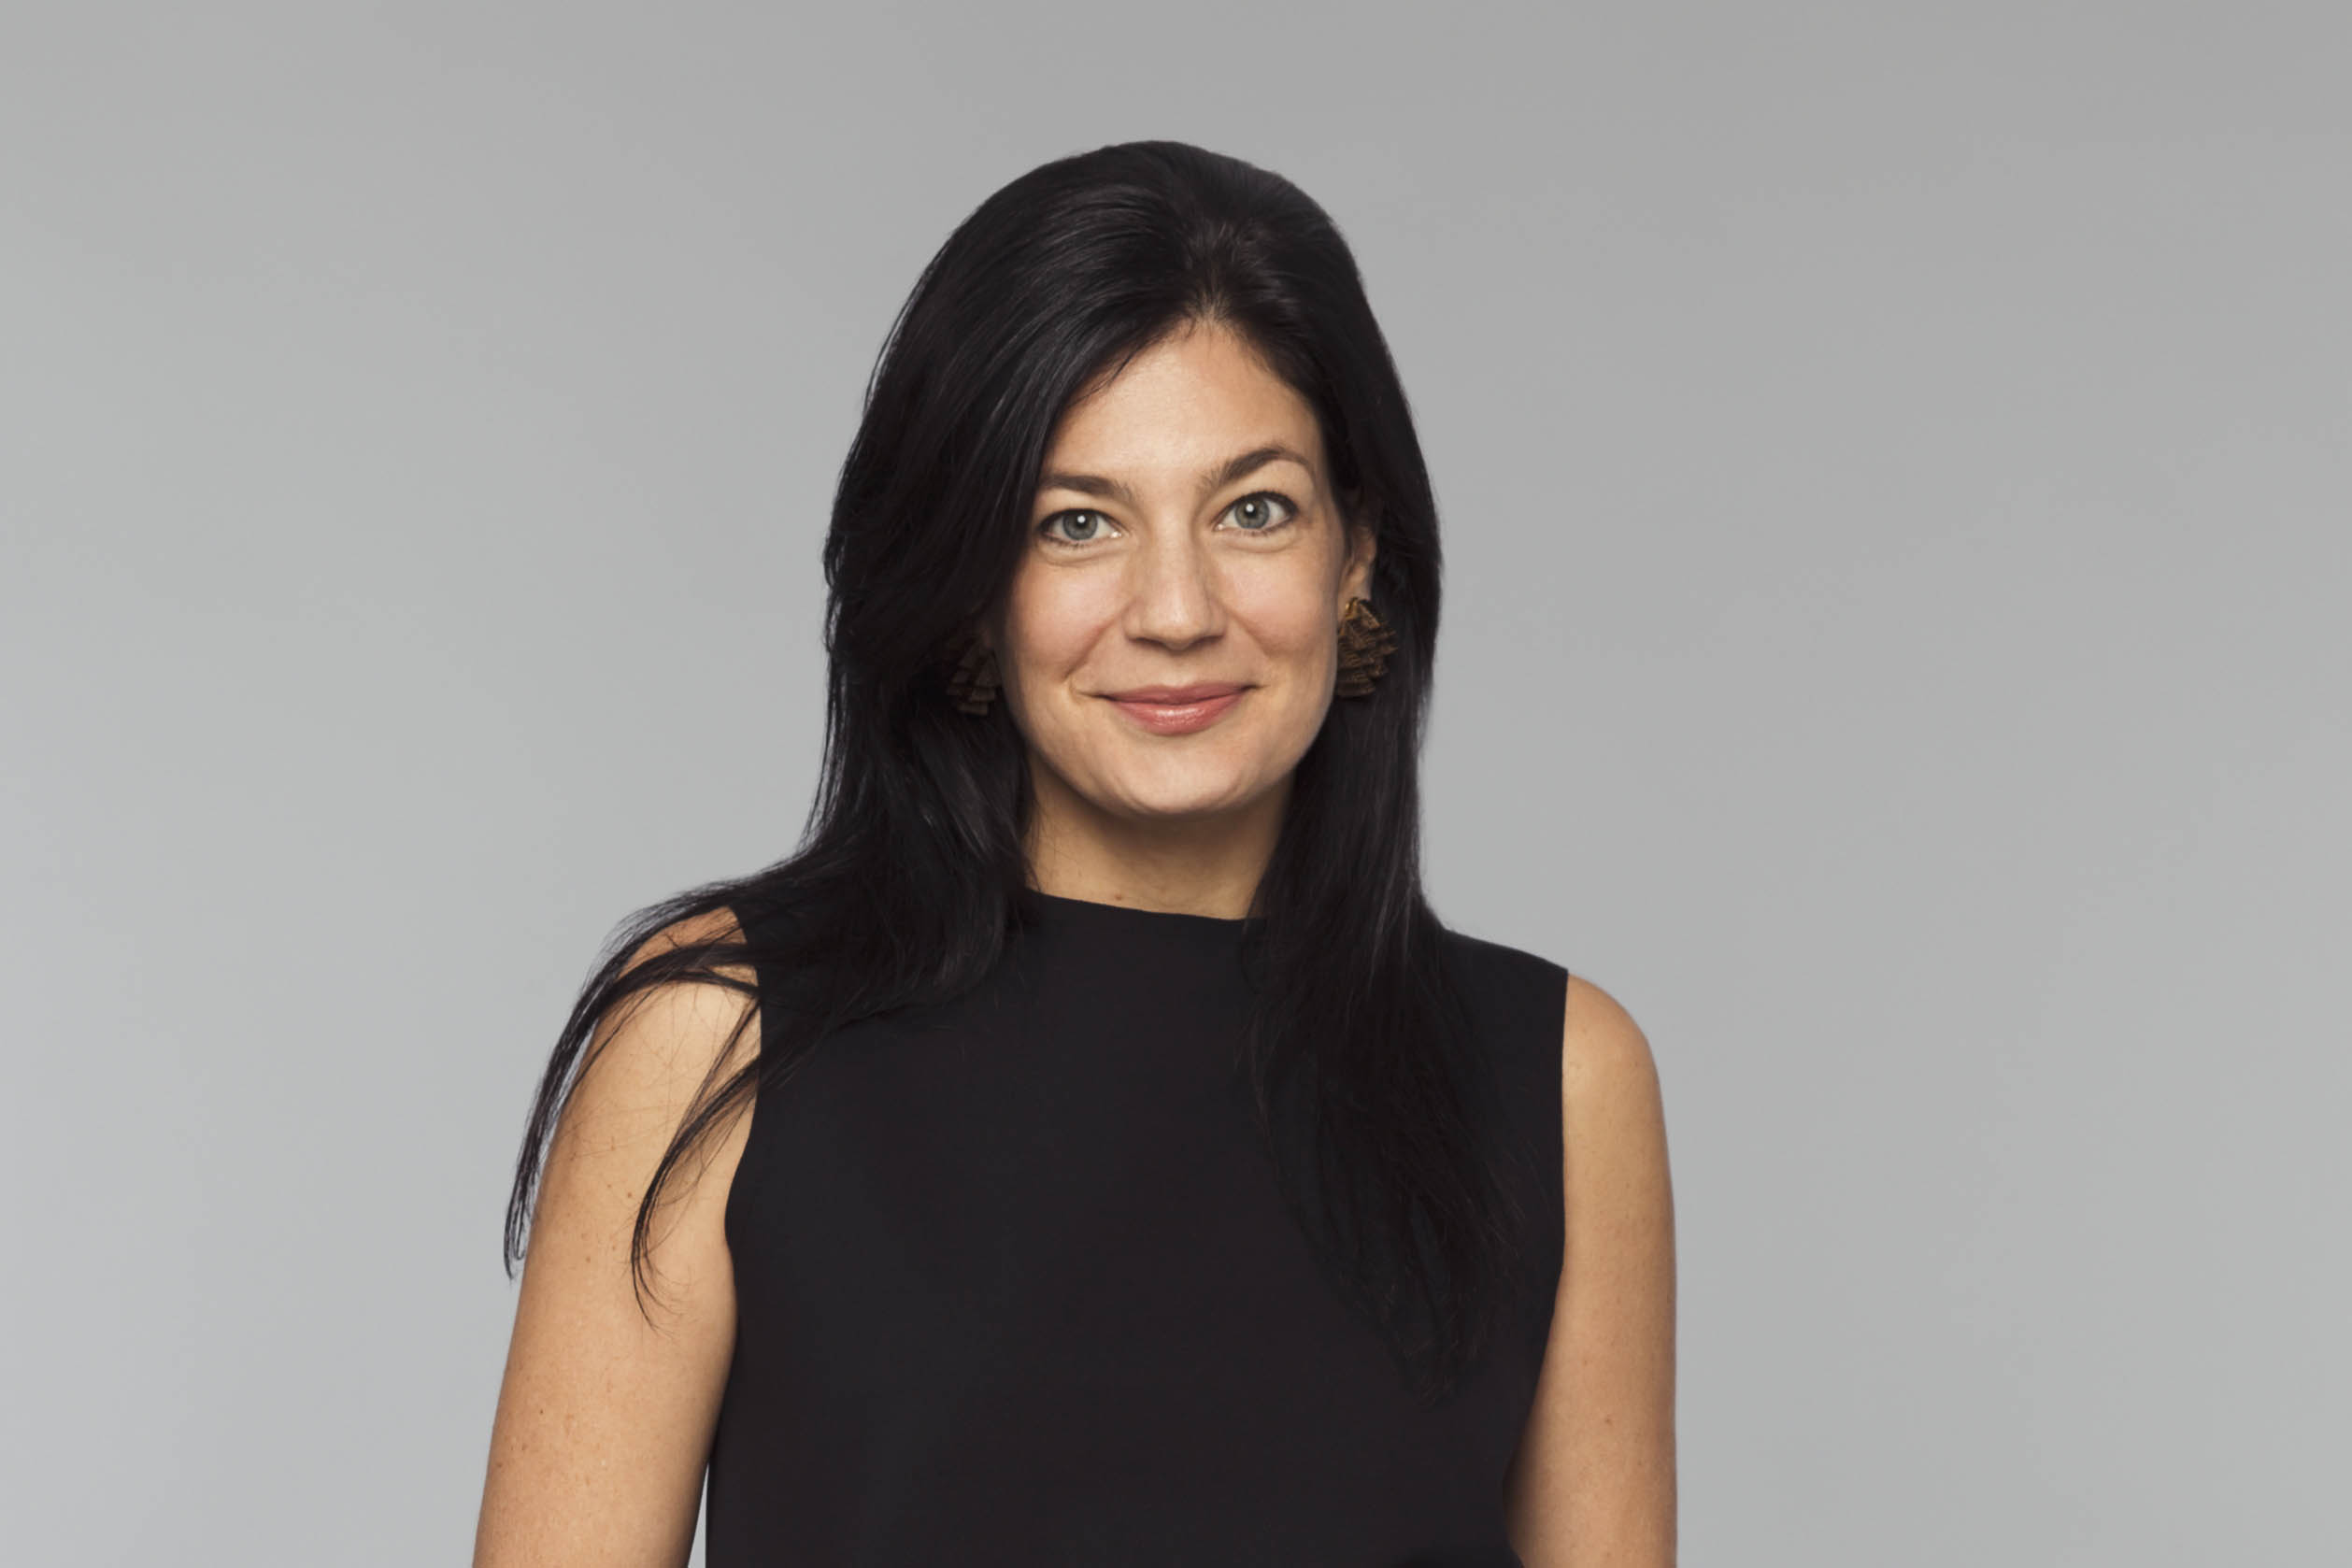 #MeToo, Feminism, Journalism, Karla Bookman, The Swaddle, Webby Awards